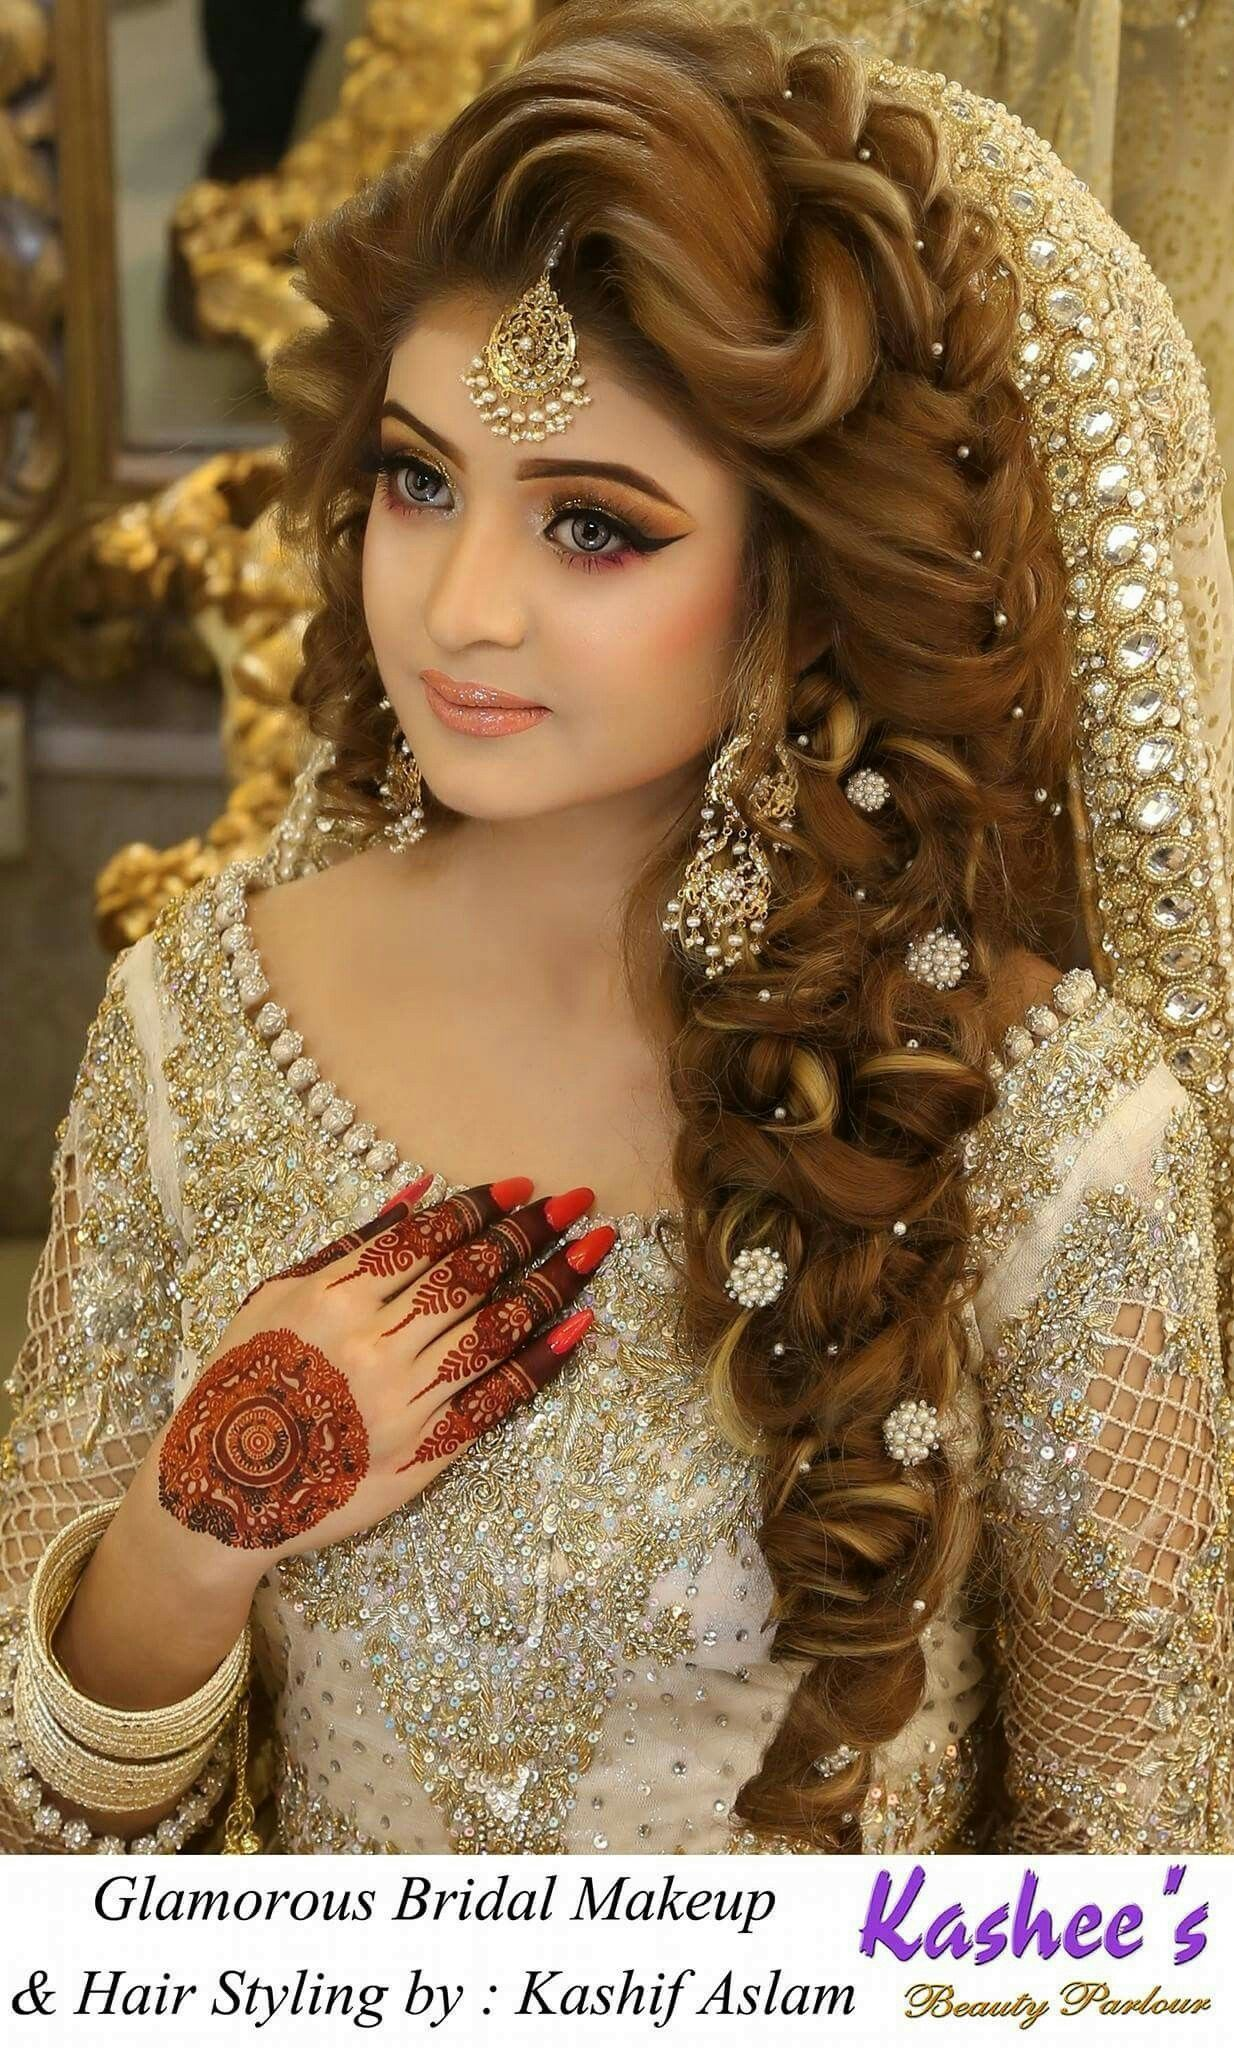 Pakistani Wedding Hairstyles Pictures Muslim Pinmano Bibi On Hair Styals Pakist Pakistani Wedding Hairstyles Pakistani Bridal Hairstyles Short Wedding Hair